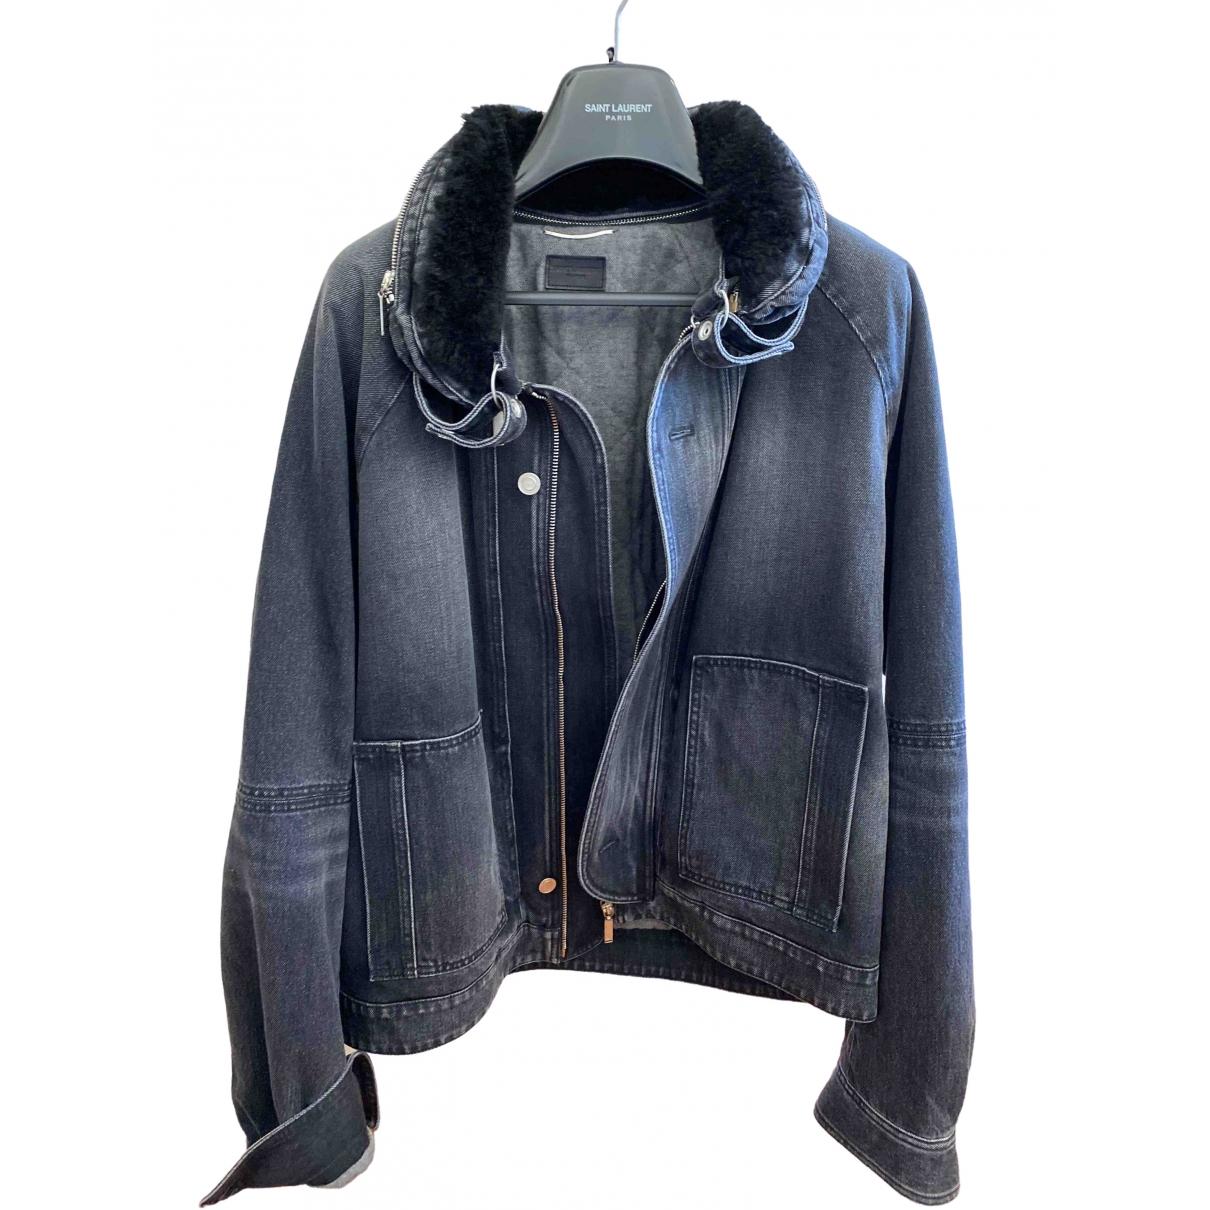 Saint Laurent \N Grey Denim - Jeans jacket  for Men XL International